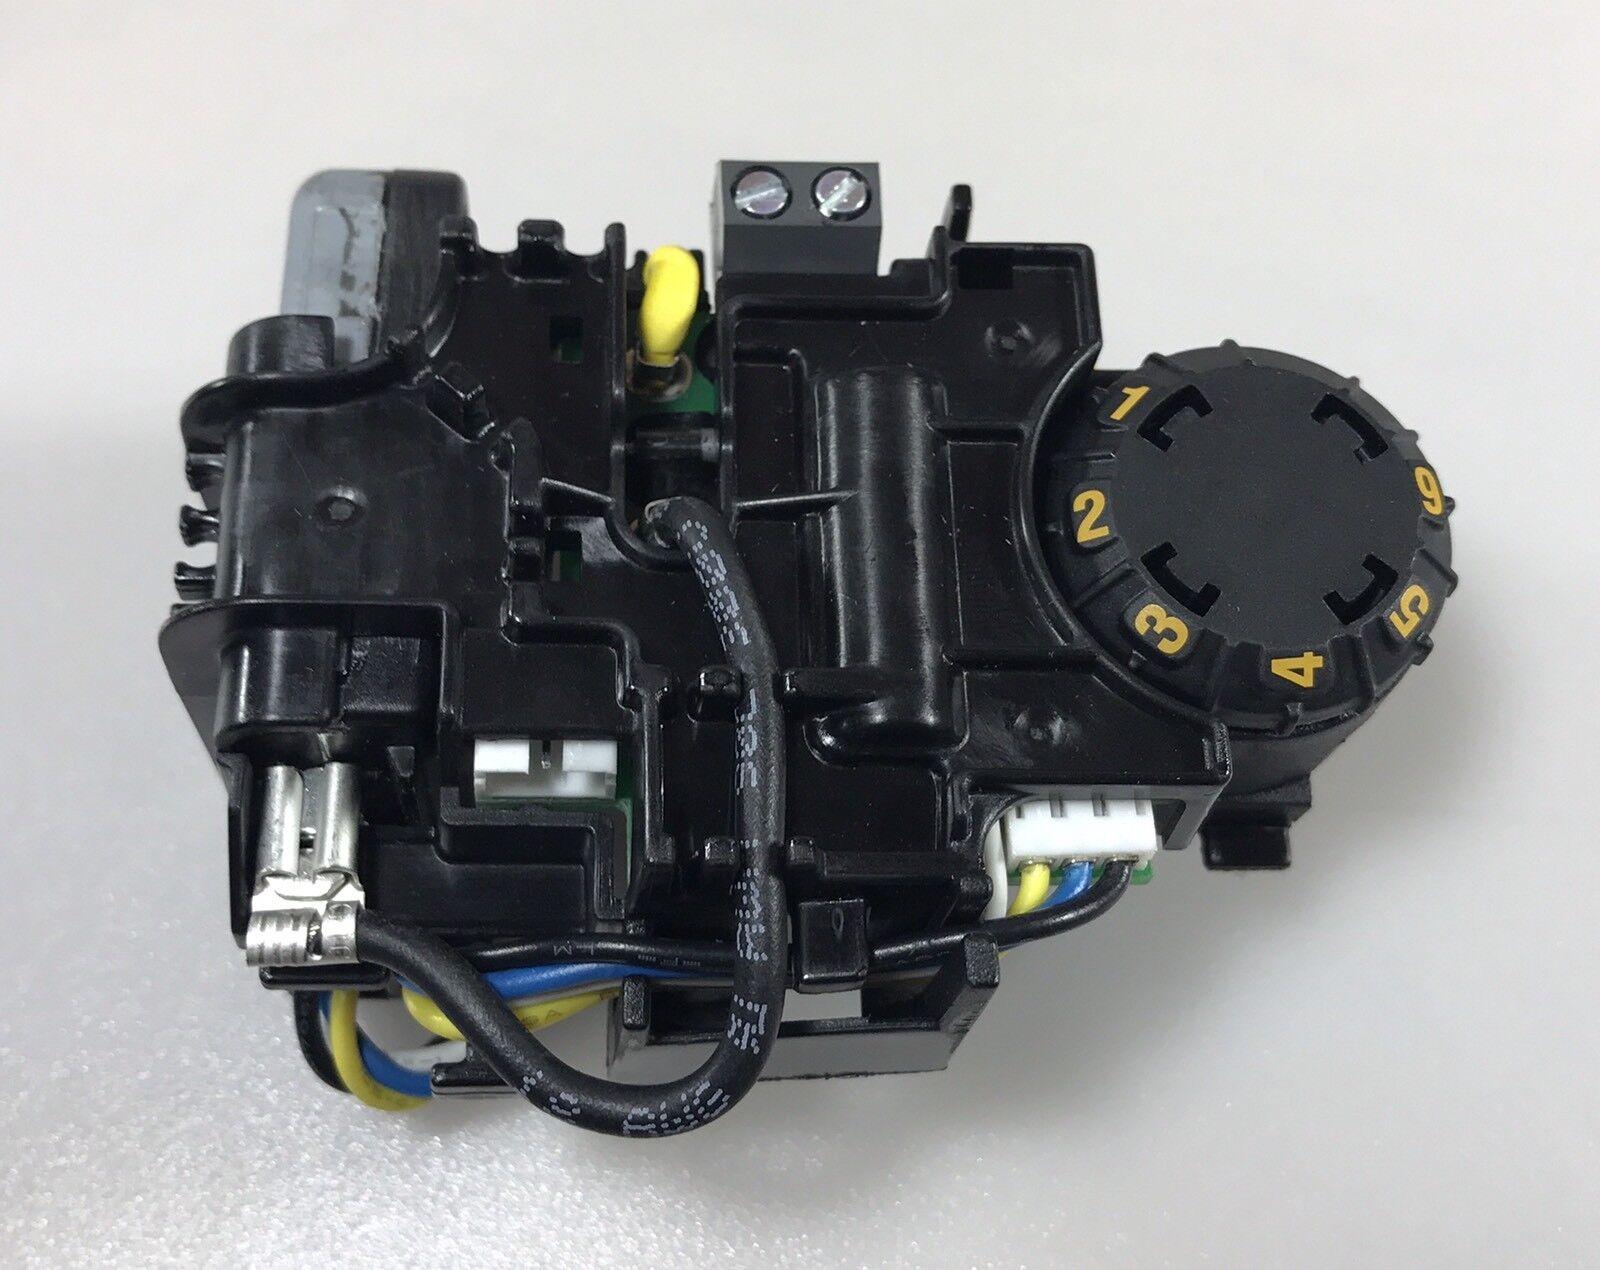 Dewalt DWP611 Compact Router 120V  Module Speed Dial